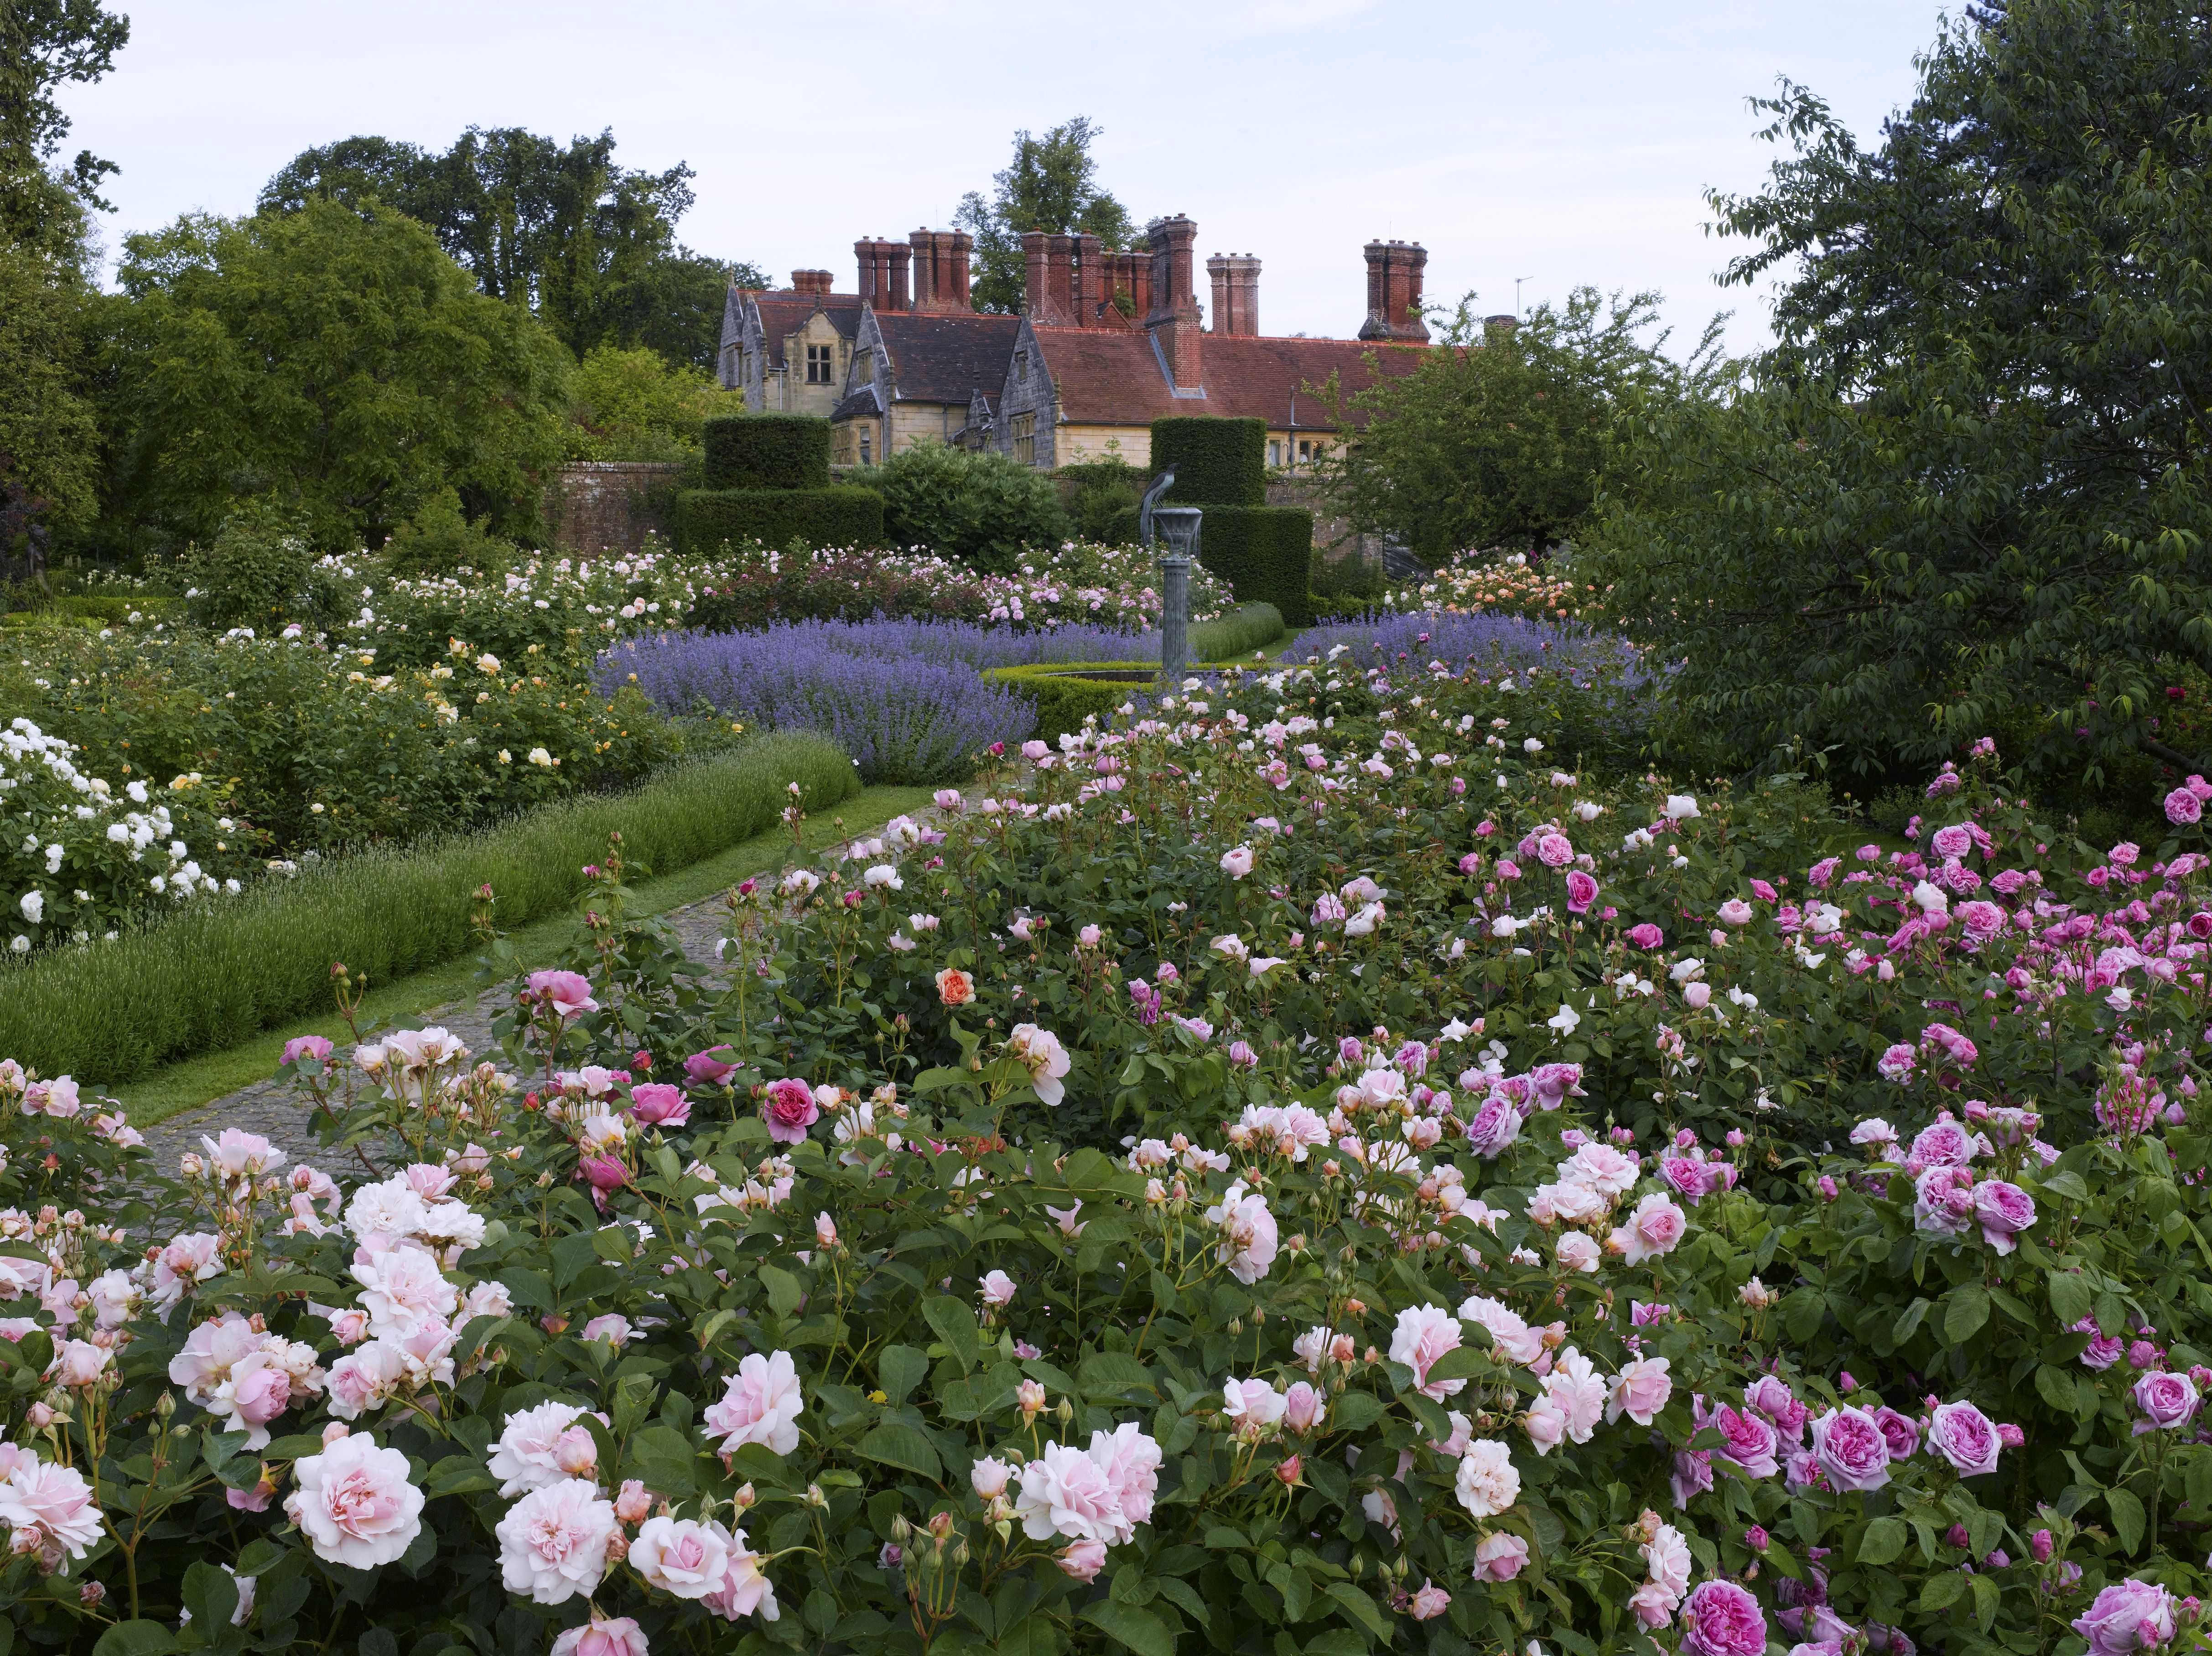 Borde Hill Garden, West Sussex, England